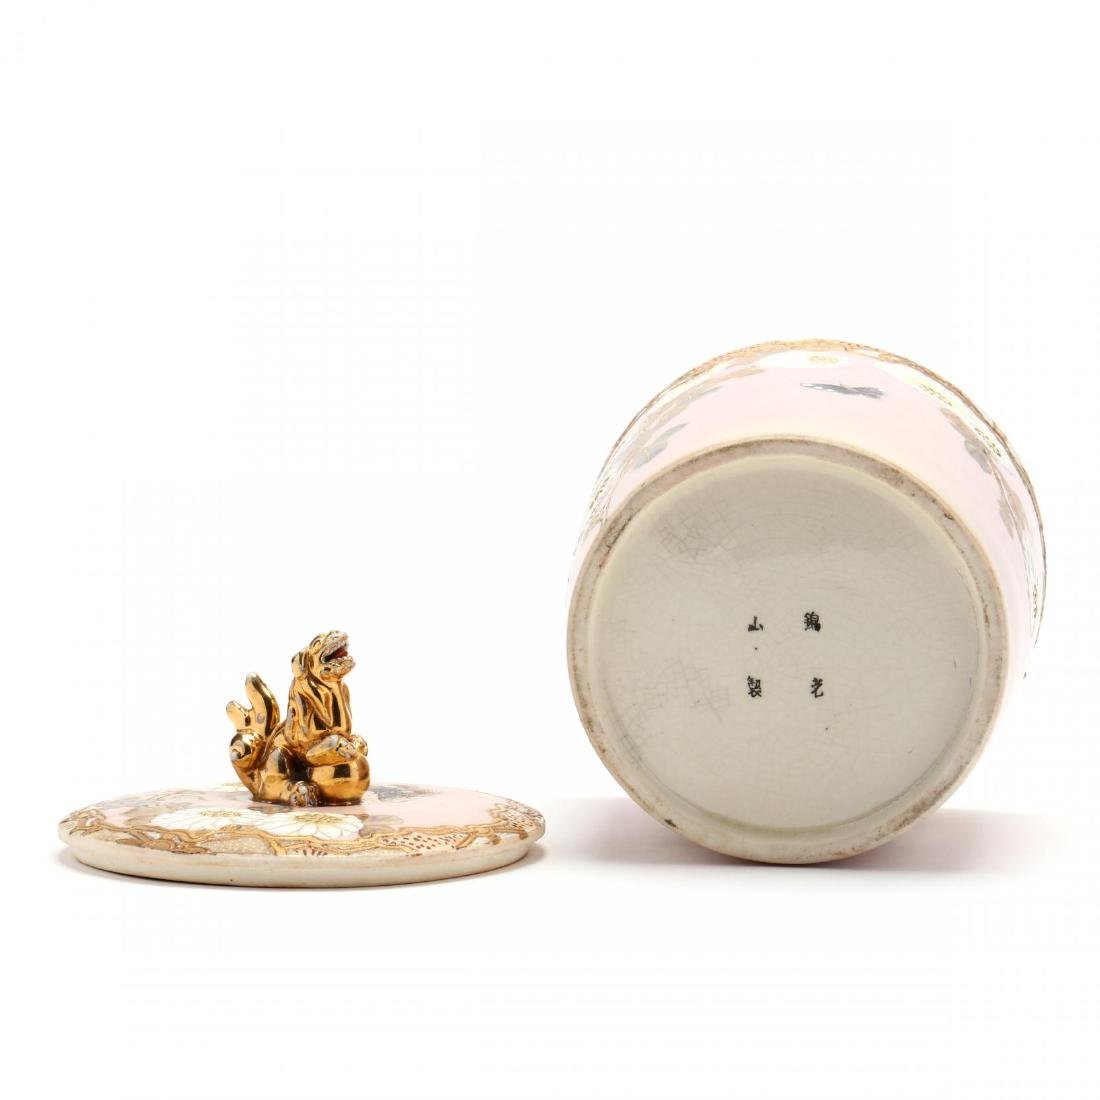 An Antique Japanese Moriage Biscuit Jar - 5